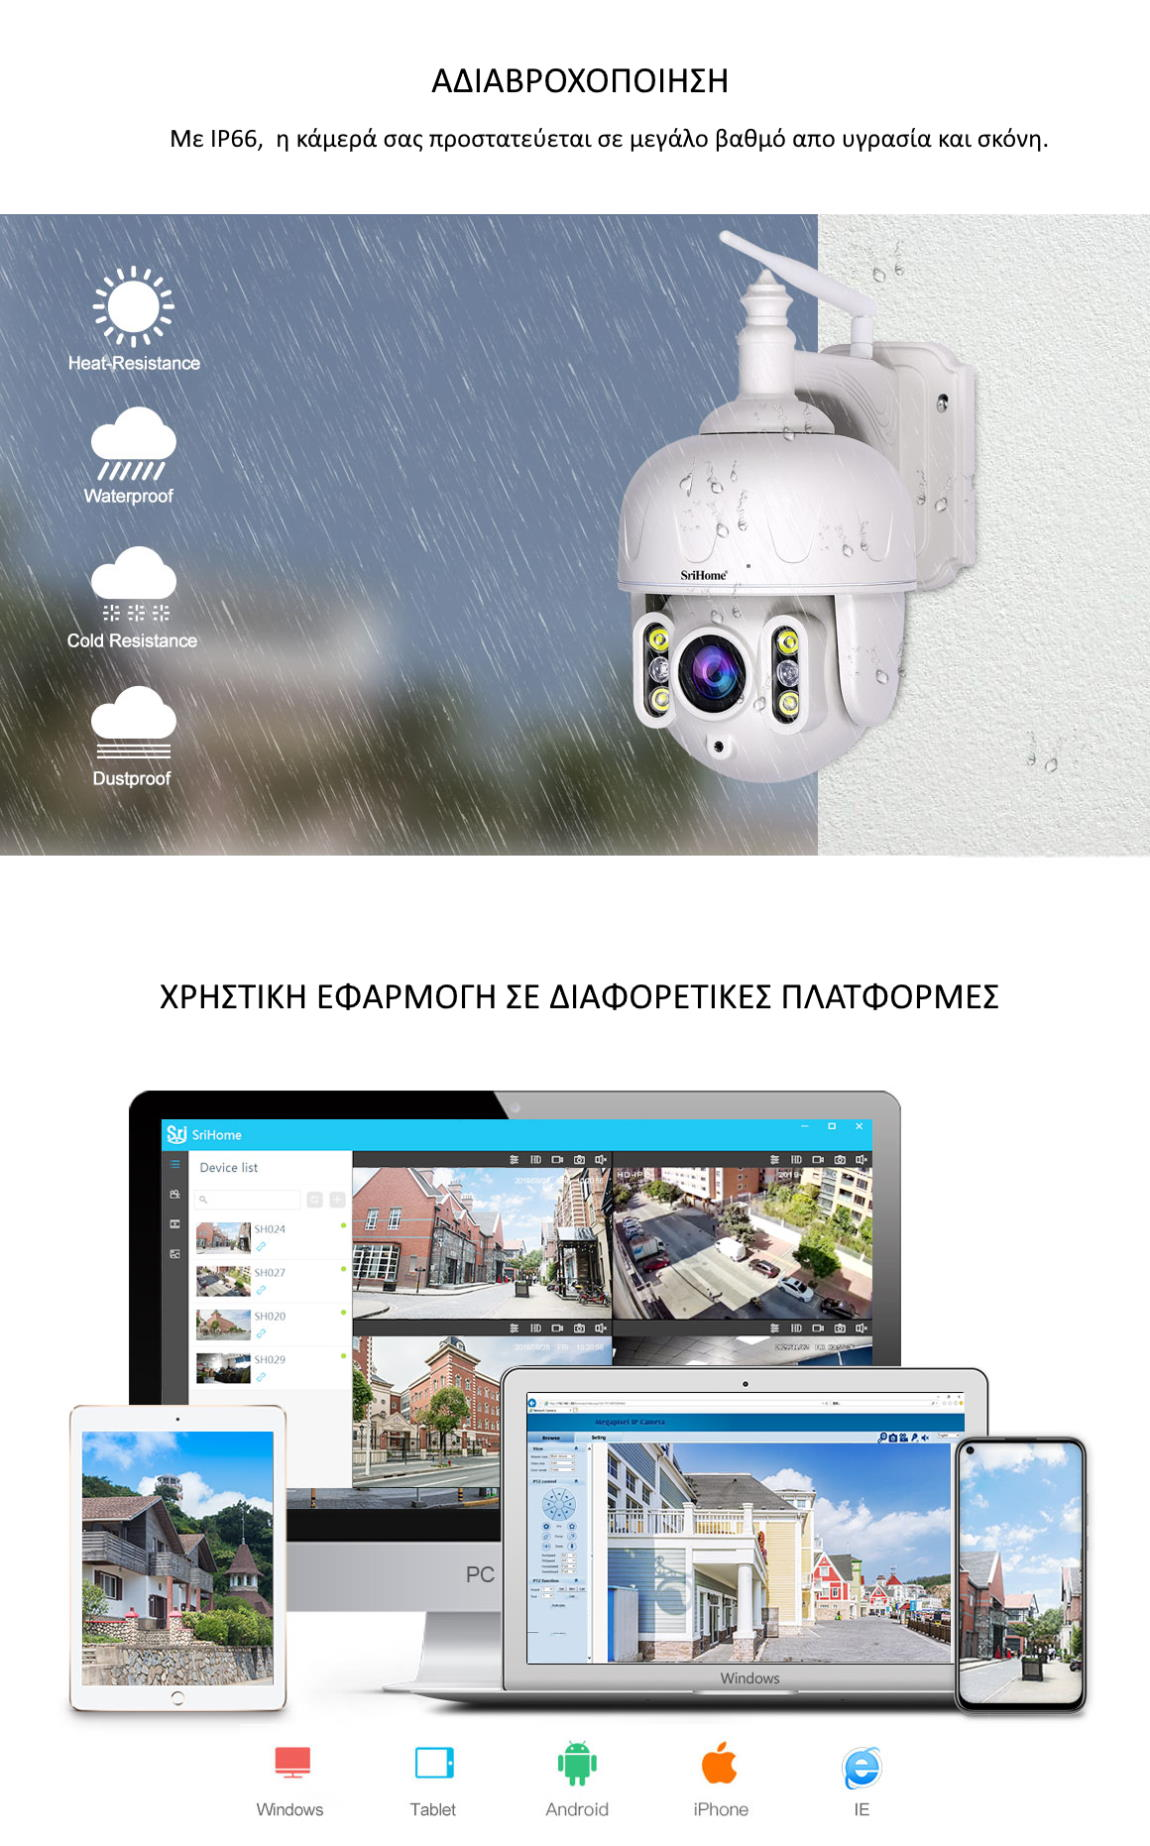 Srihome SH028 Κάμερα Ασφαλείας αδιαβροχοποίηση και μέσα αναπαραγωγής